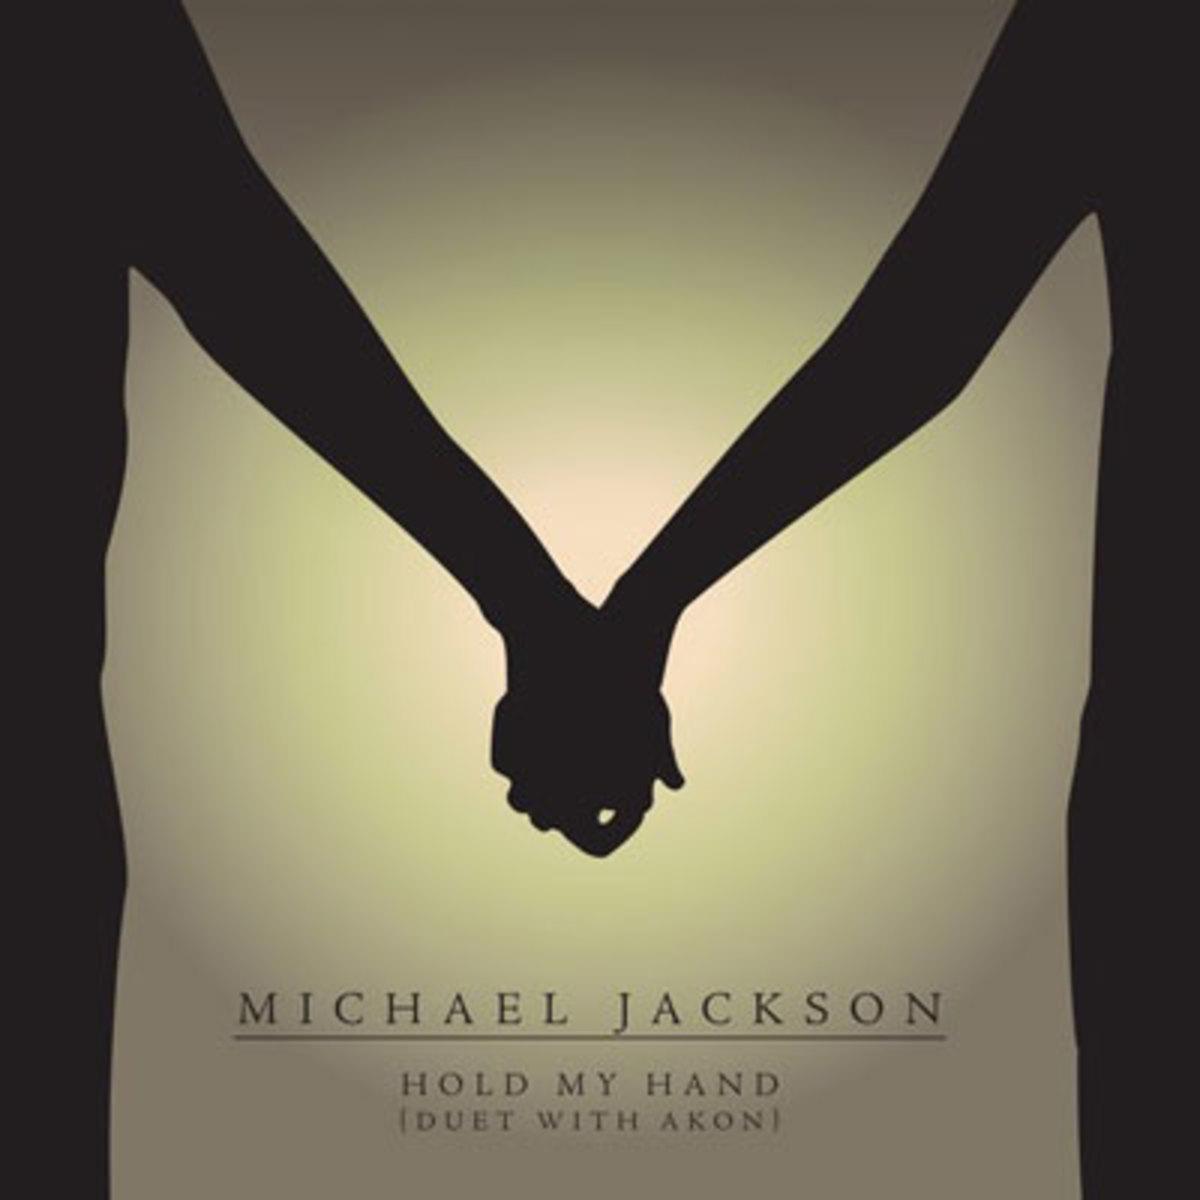 michaeljackson-holdmyhand.jpg